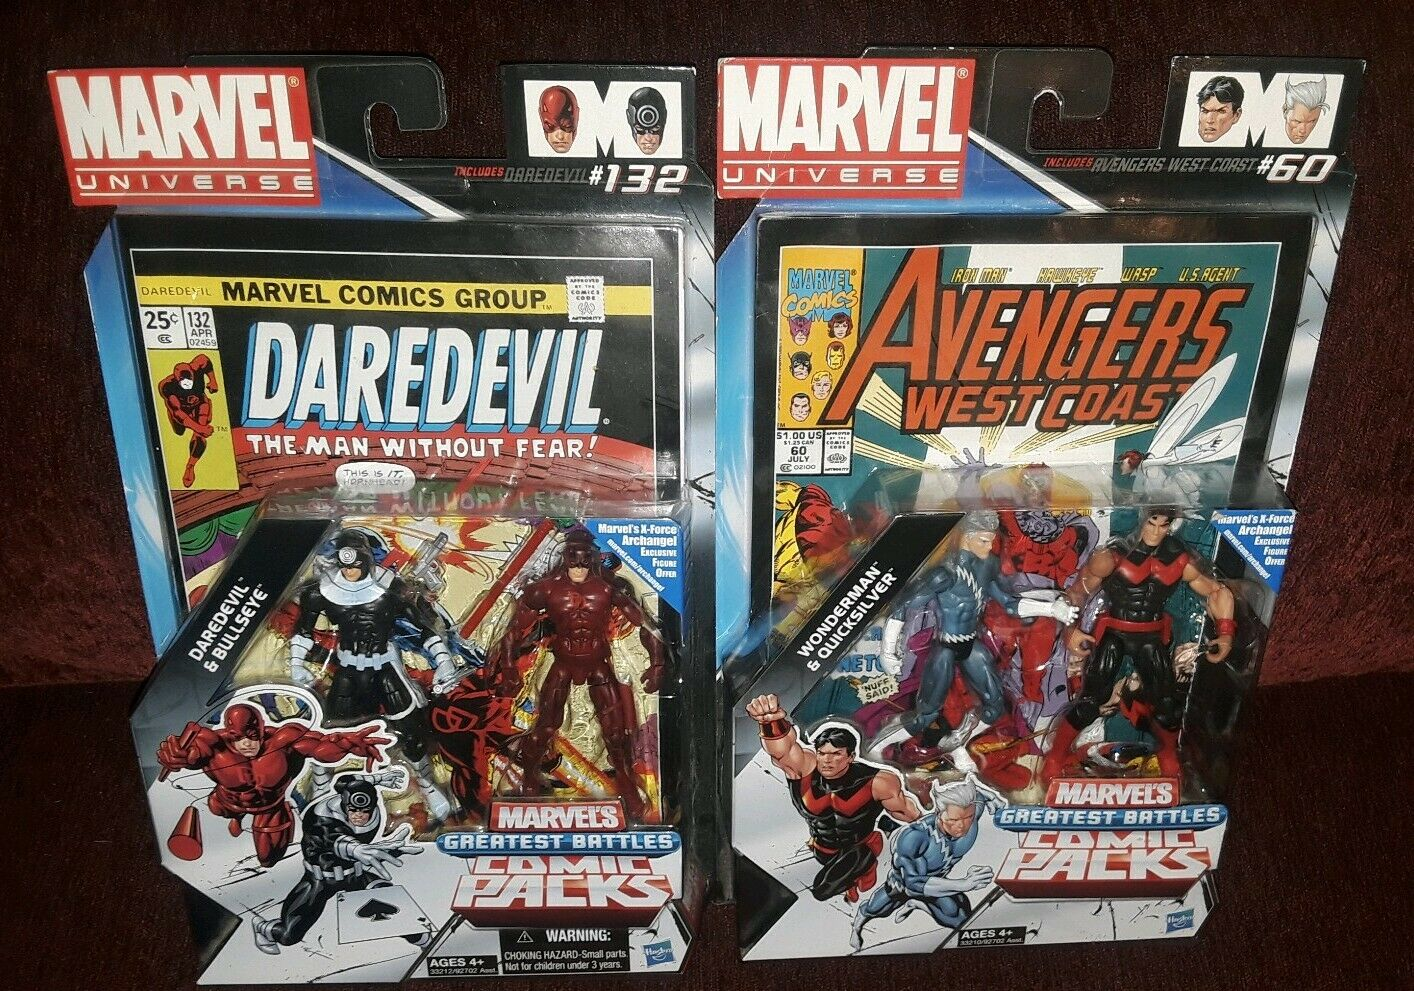 Marvel Universe LEGENDS Comic Packs  LOT QuickSilber Wonderman DArotEVIL RARE